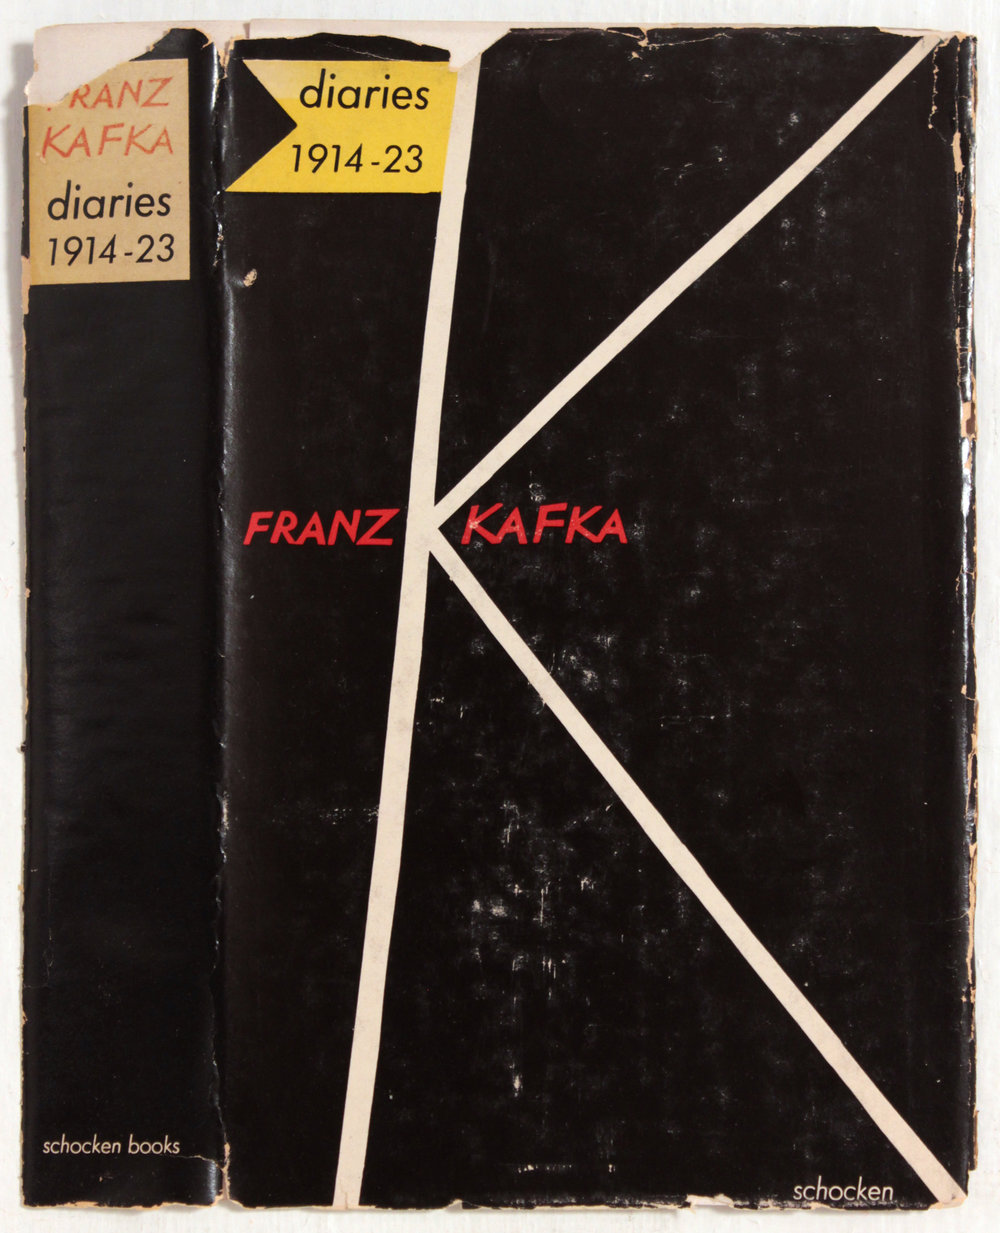 6. 1950's c, Diaries Franz Kafka, Book Cover, 8.25x4.50, PPS 1430.JPG